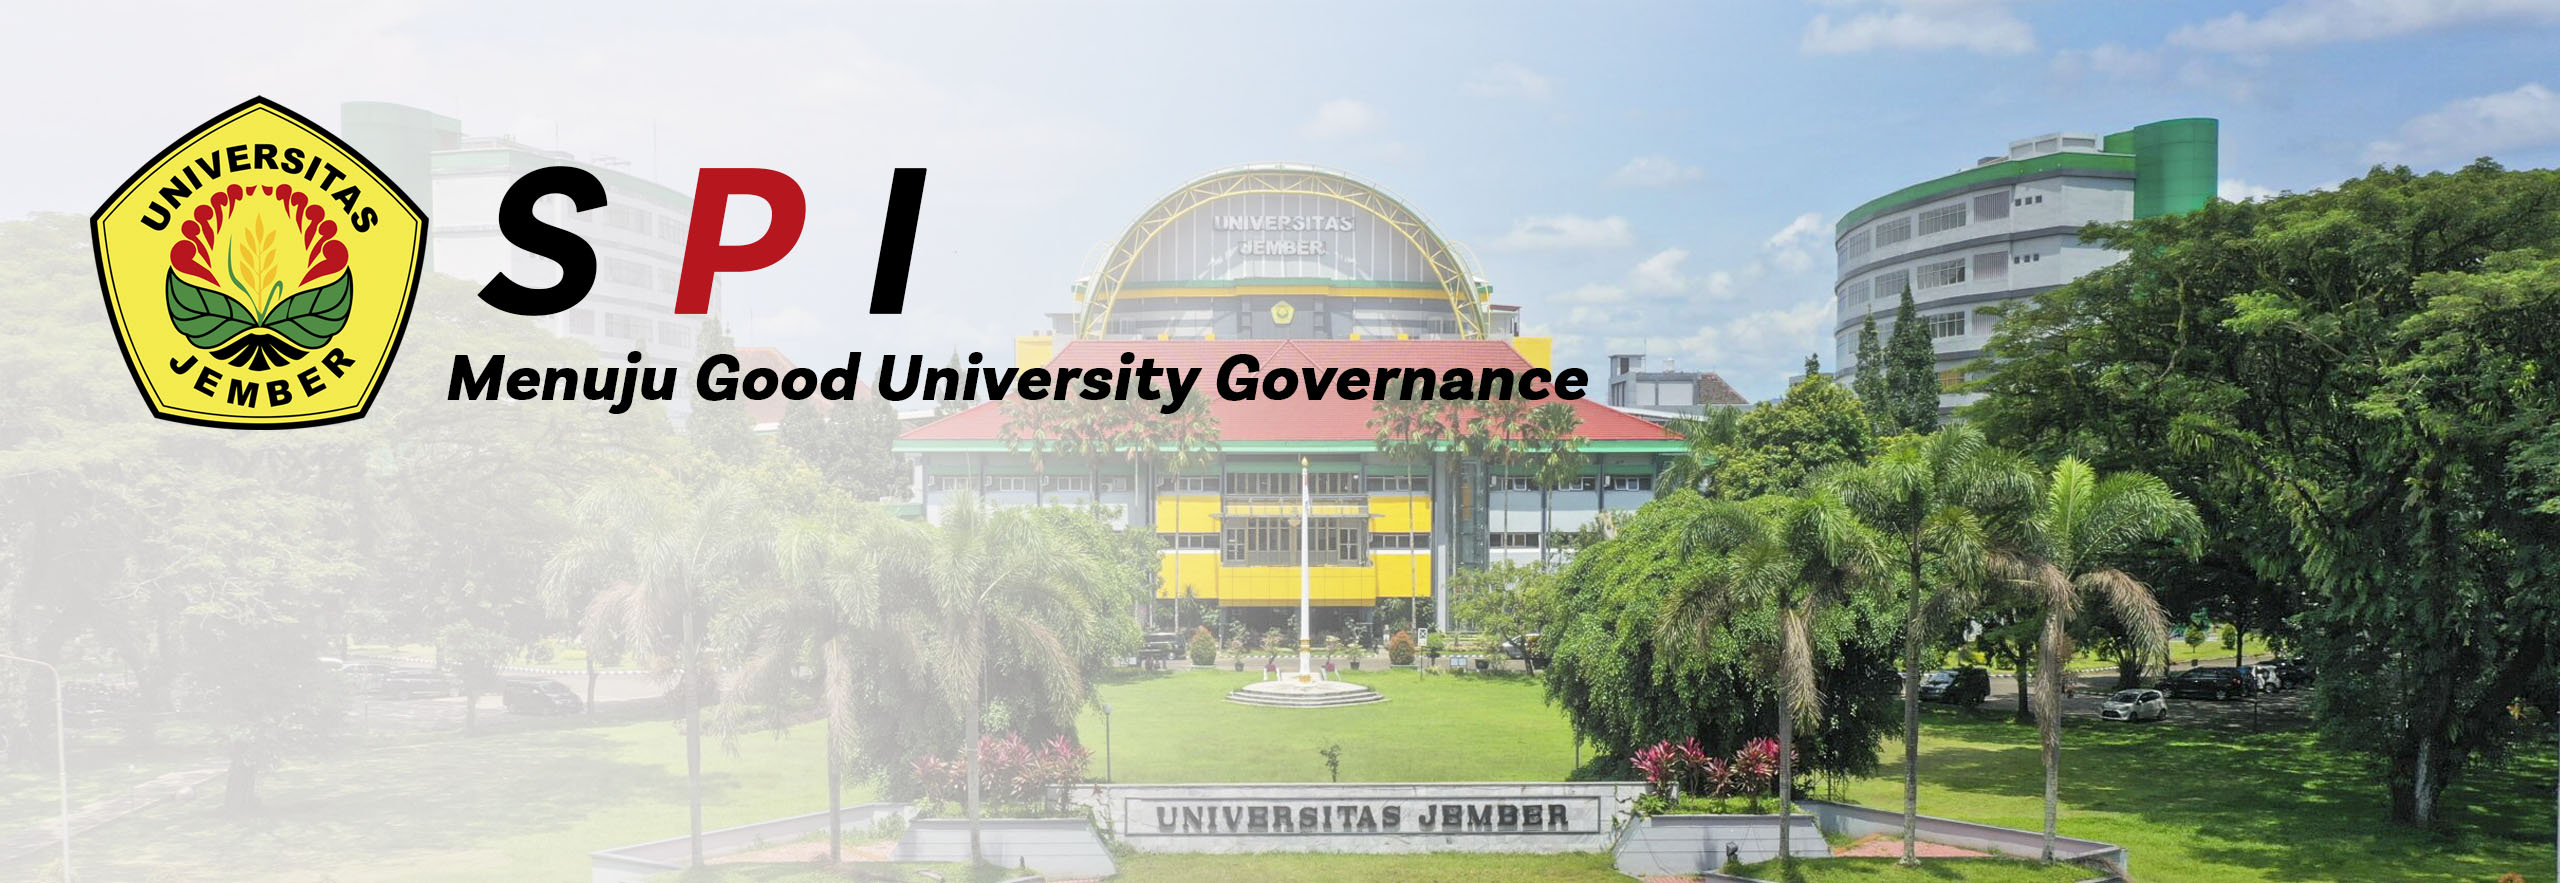 SPI – Menuju Good University Governance